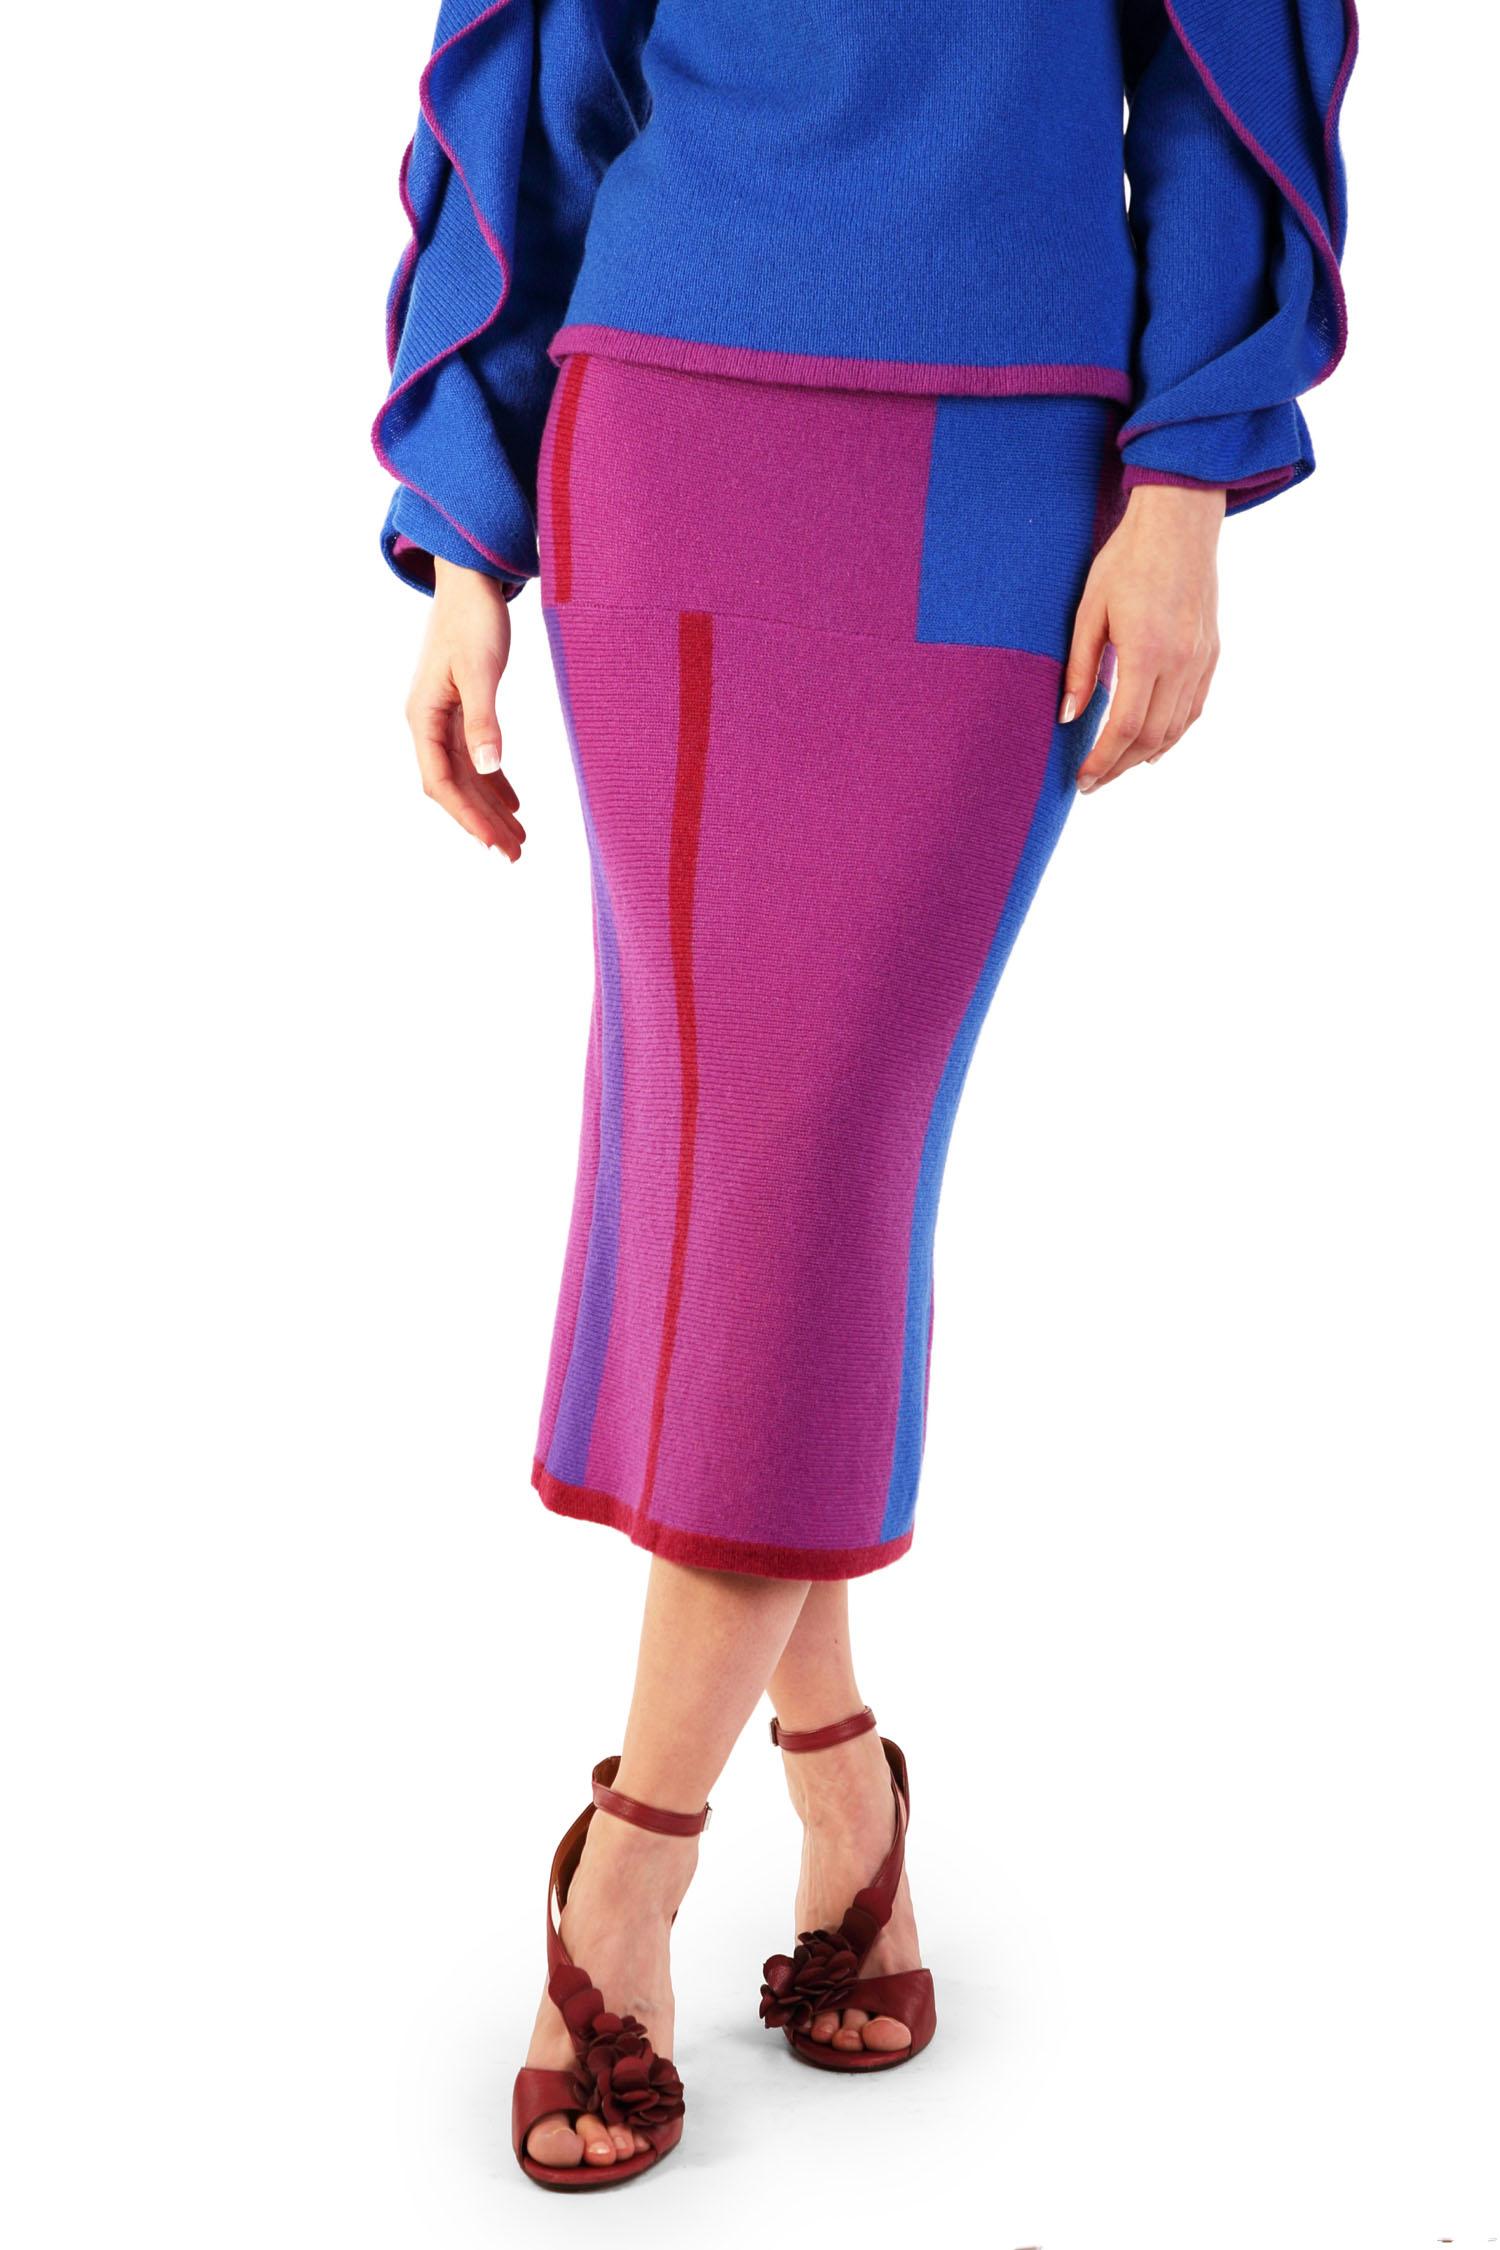 Mondrian pencil skirt